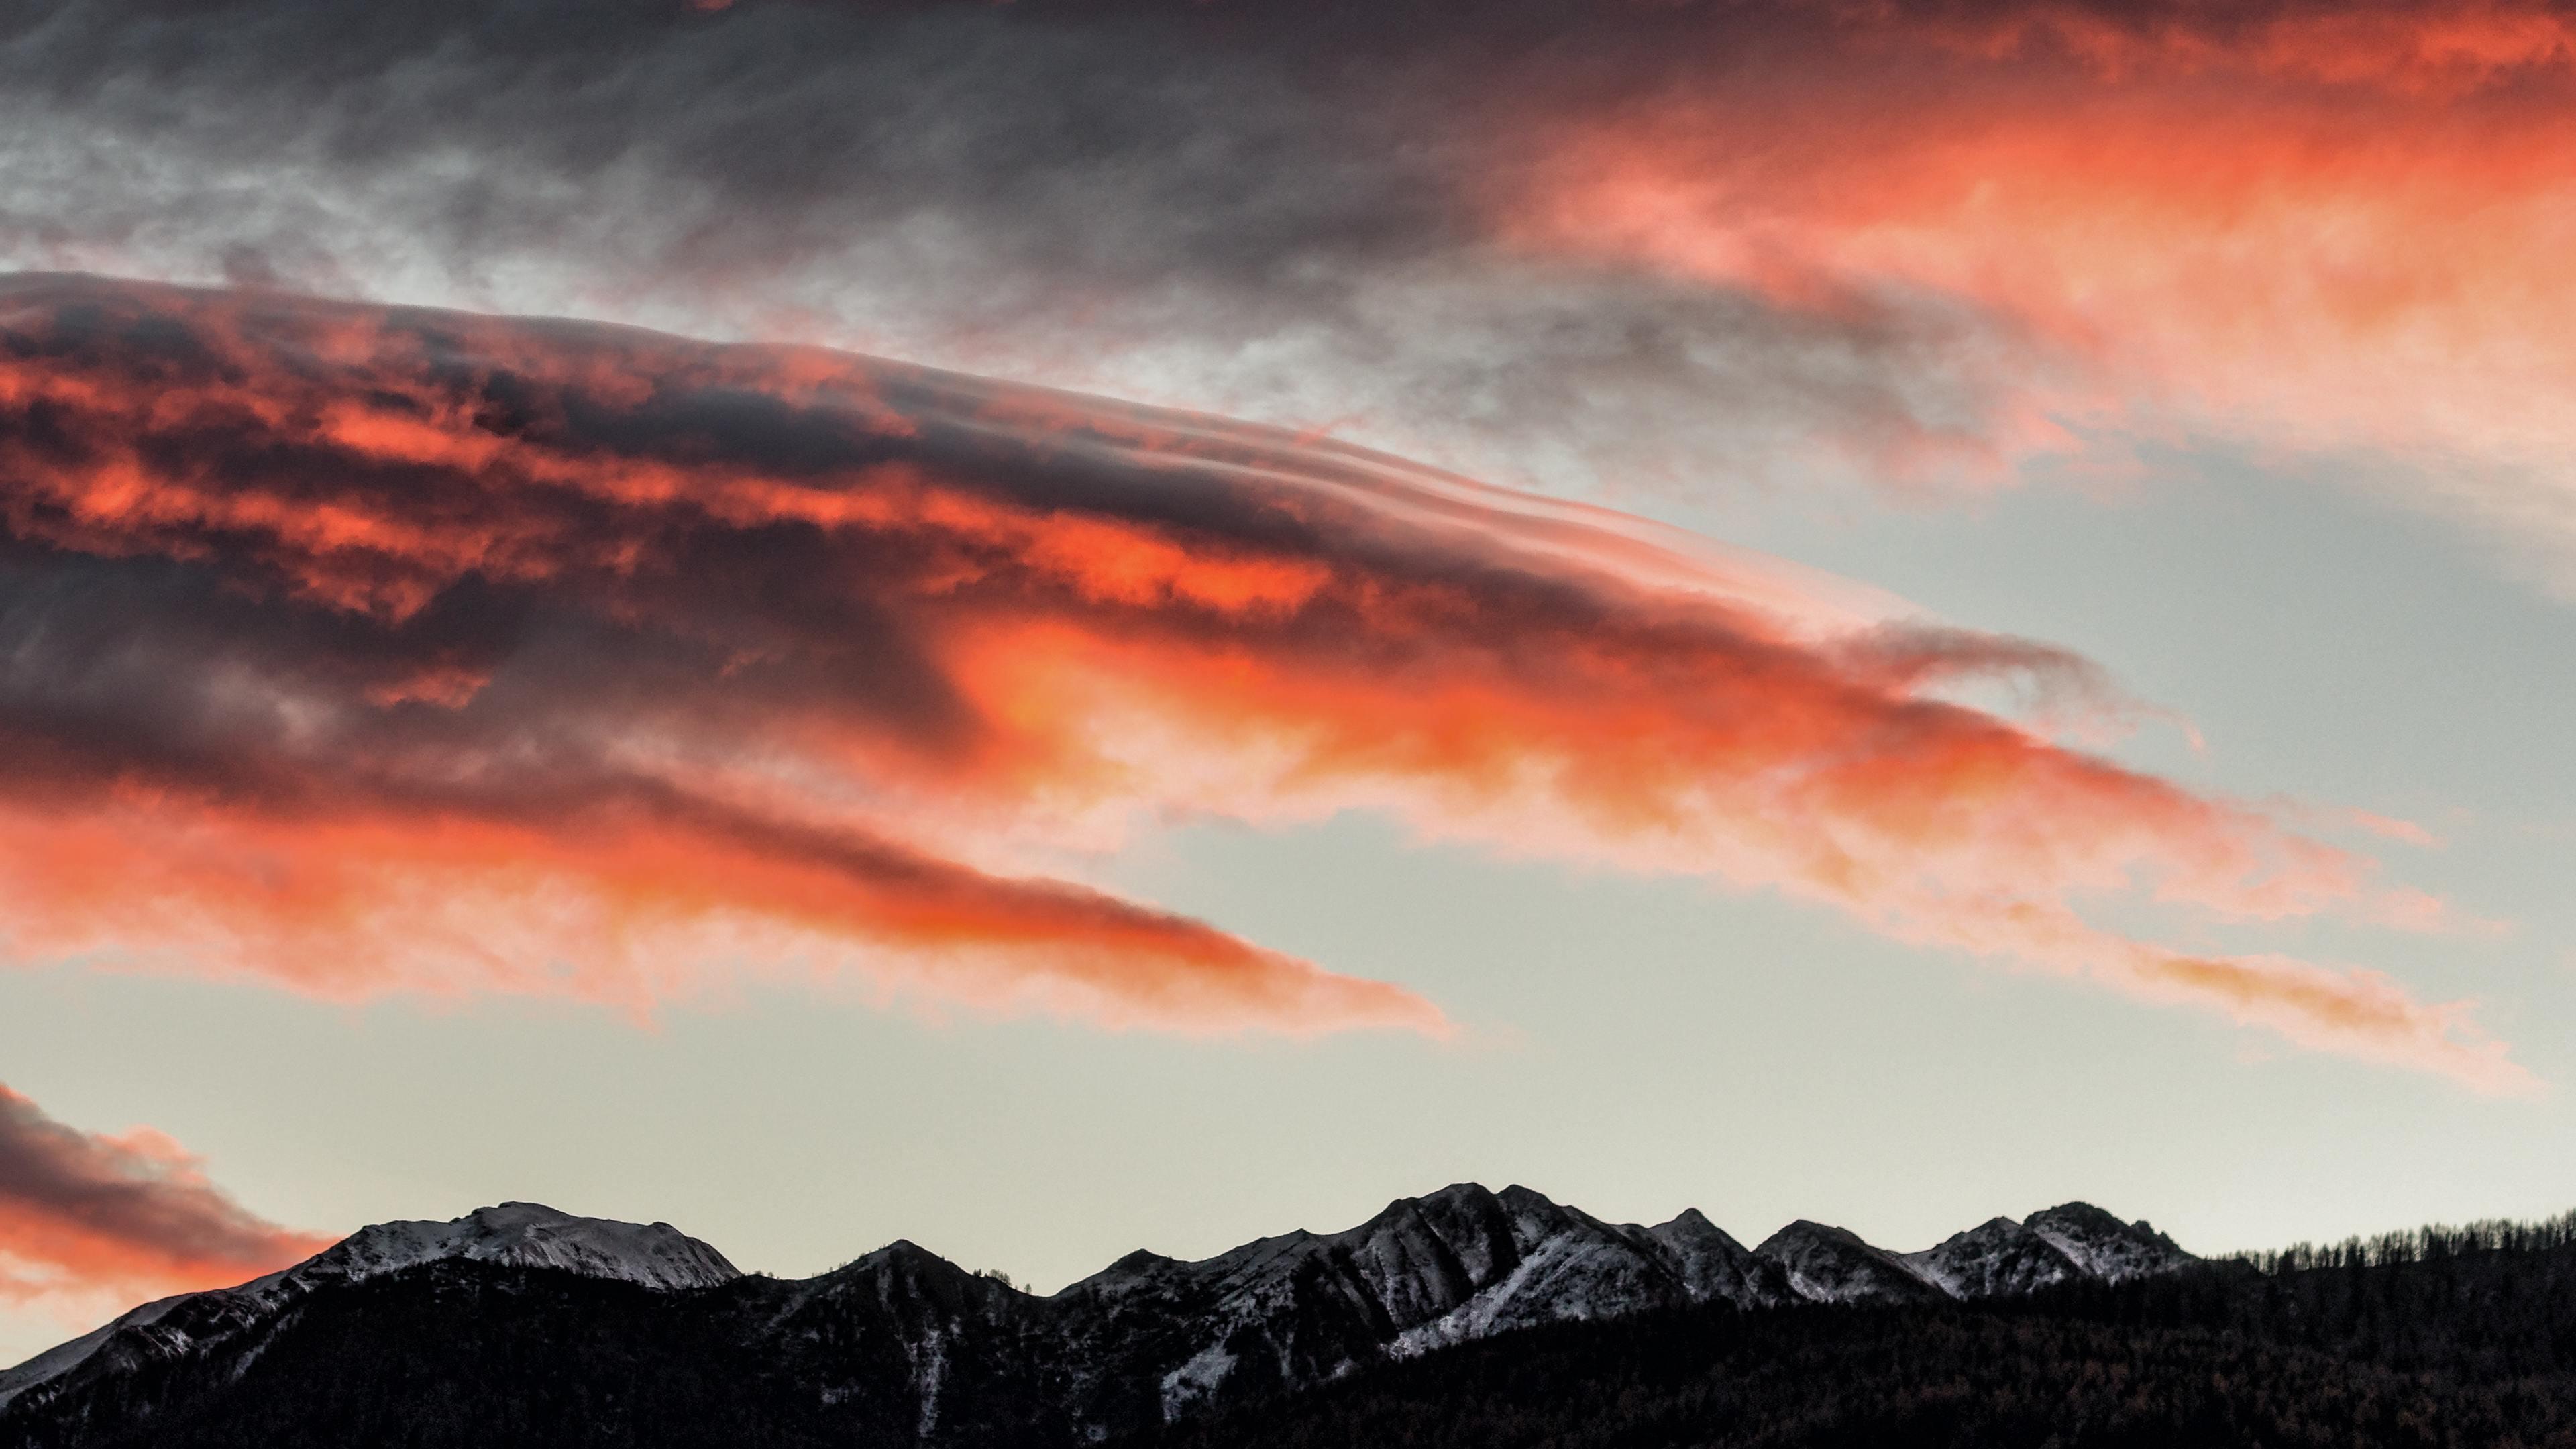 5k dusk dawn clouds 4k 1540137264 - 5k Dusk Dawn Clouds 4k - nature wallpapers, dusk wallpapers, dawn wallpapers, clouds wallpapers, 5k wallpapers, 4k-wallpapers